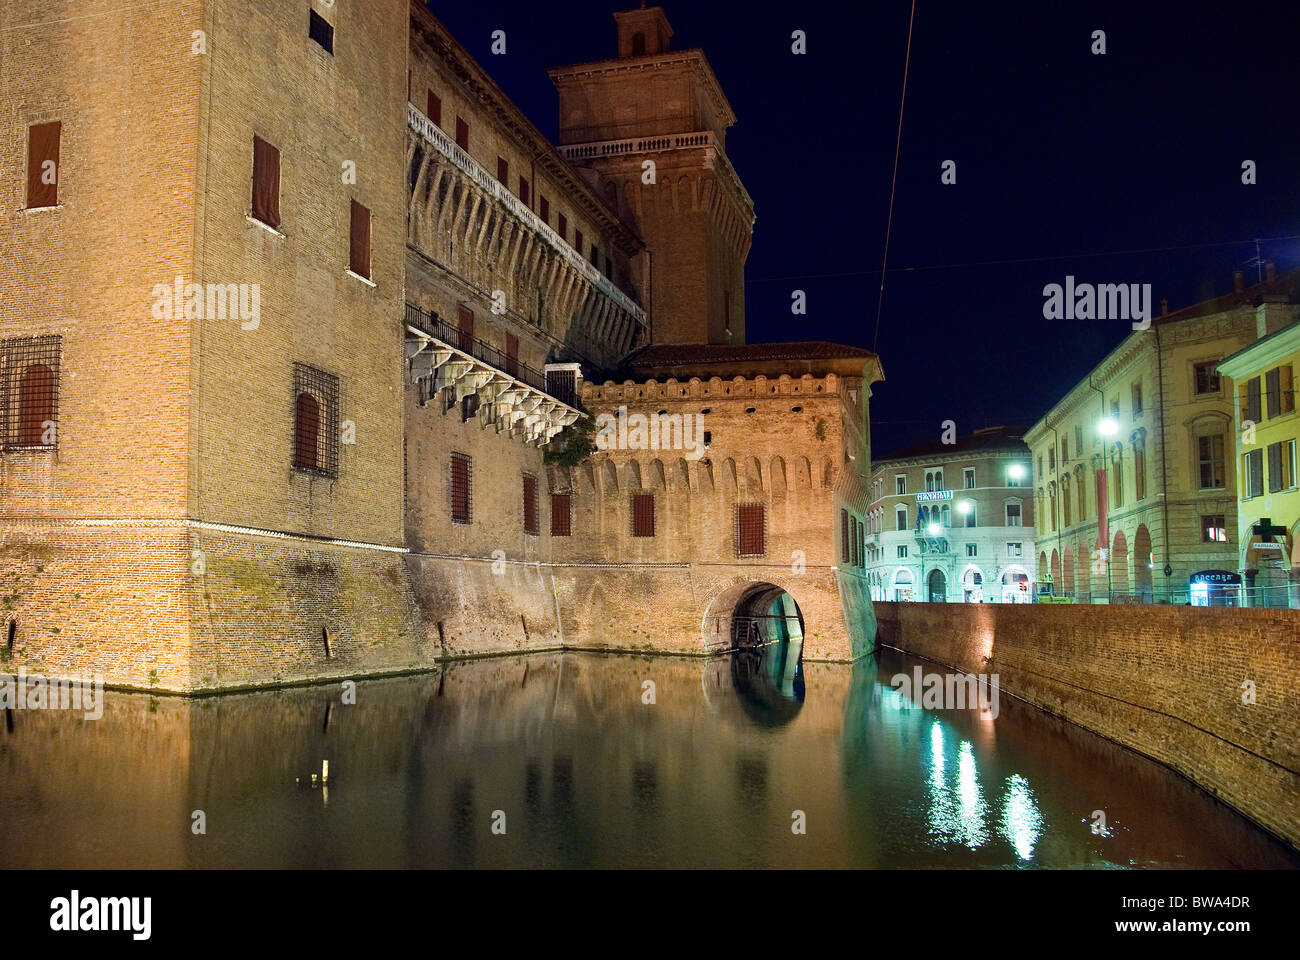 Castle Estense, Ferrara, nightime - Stock Image